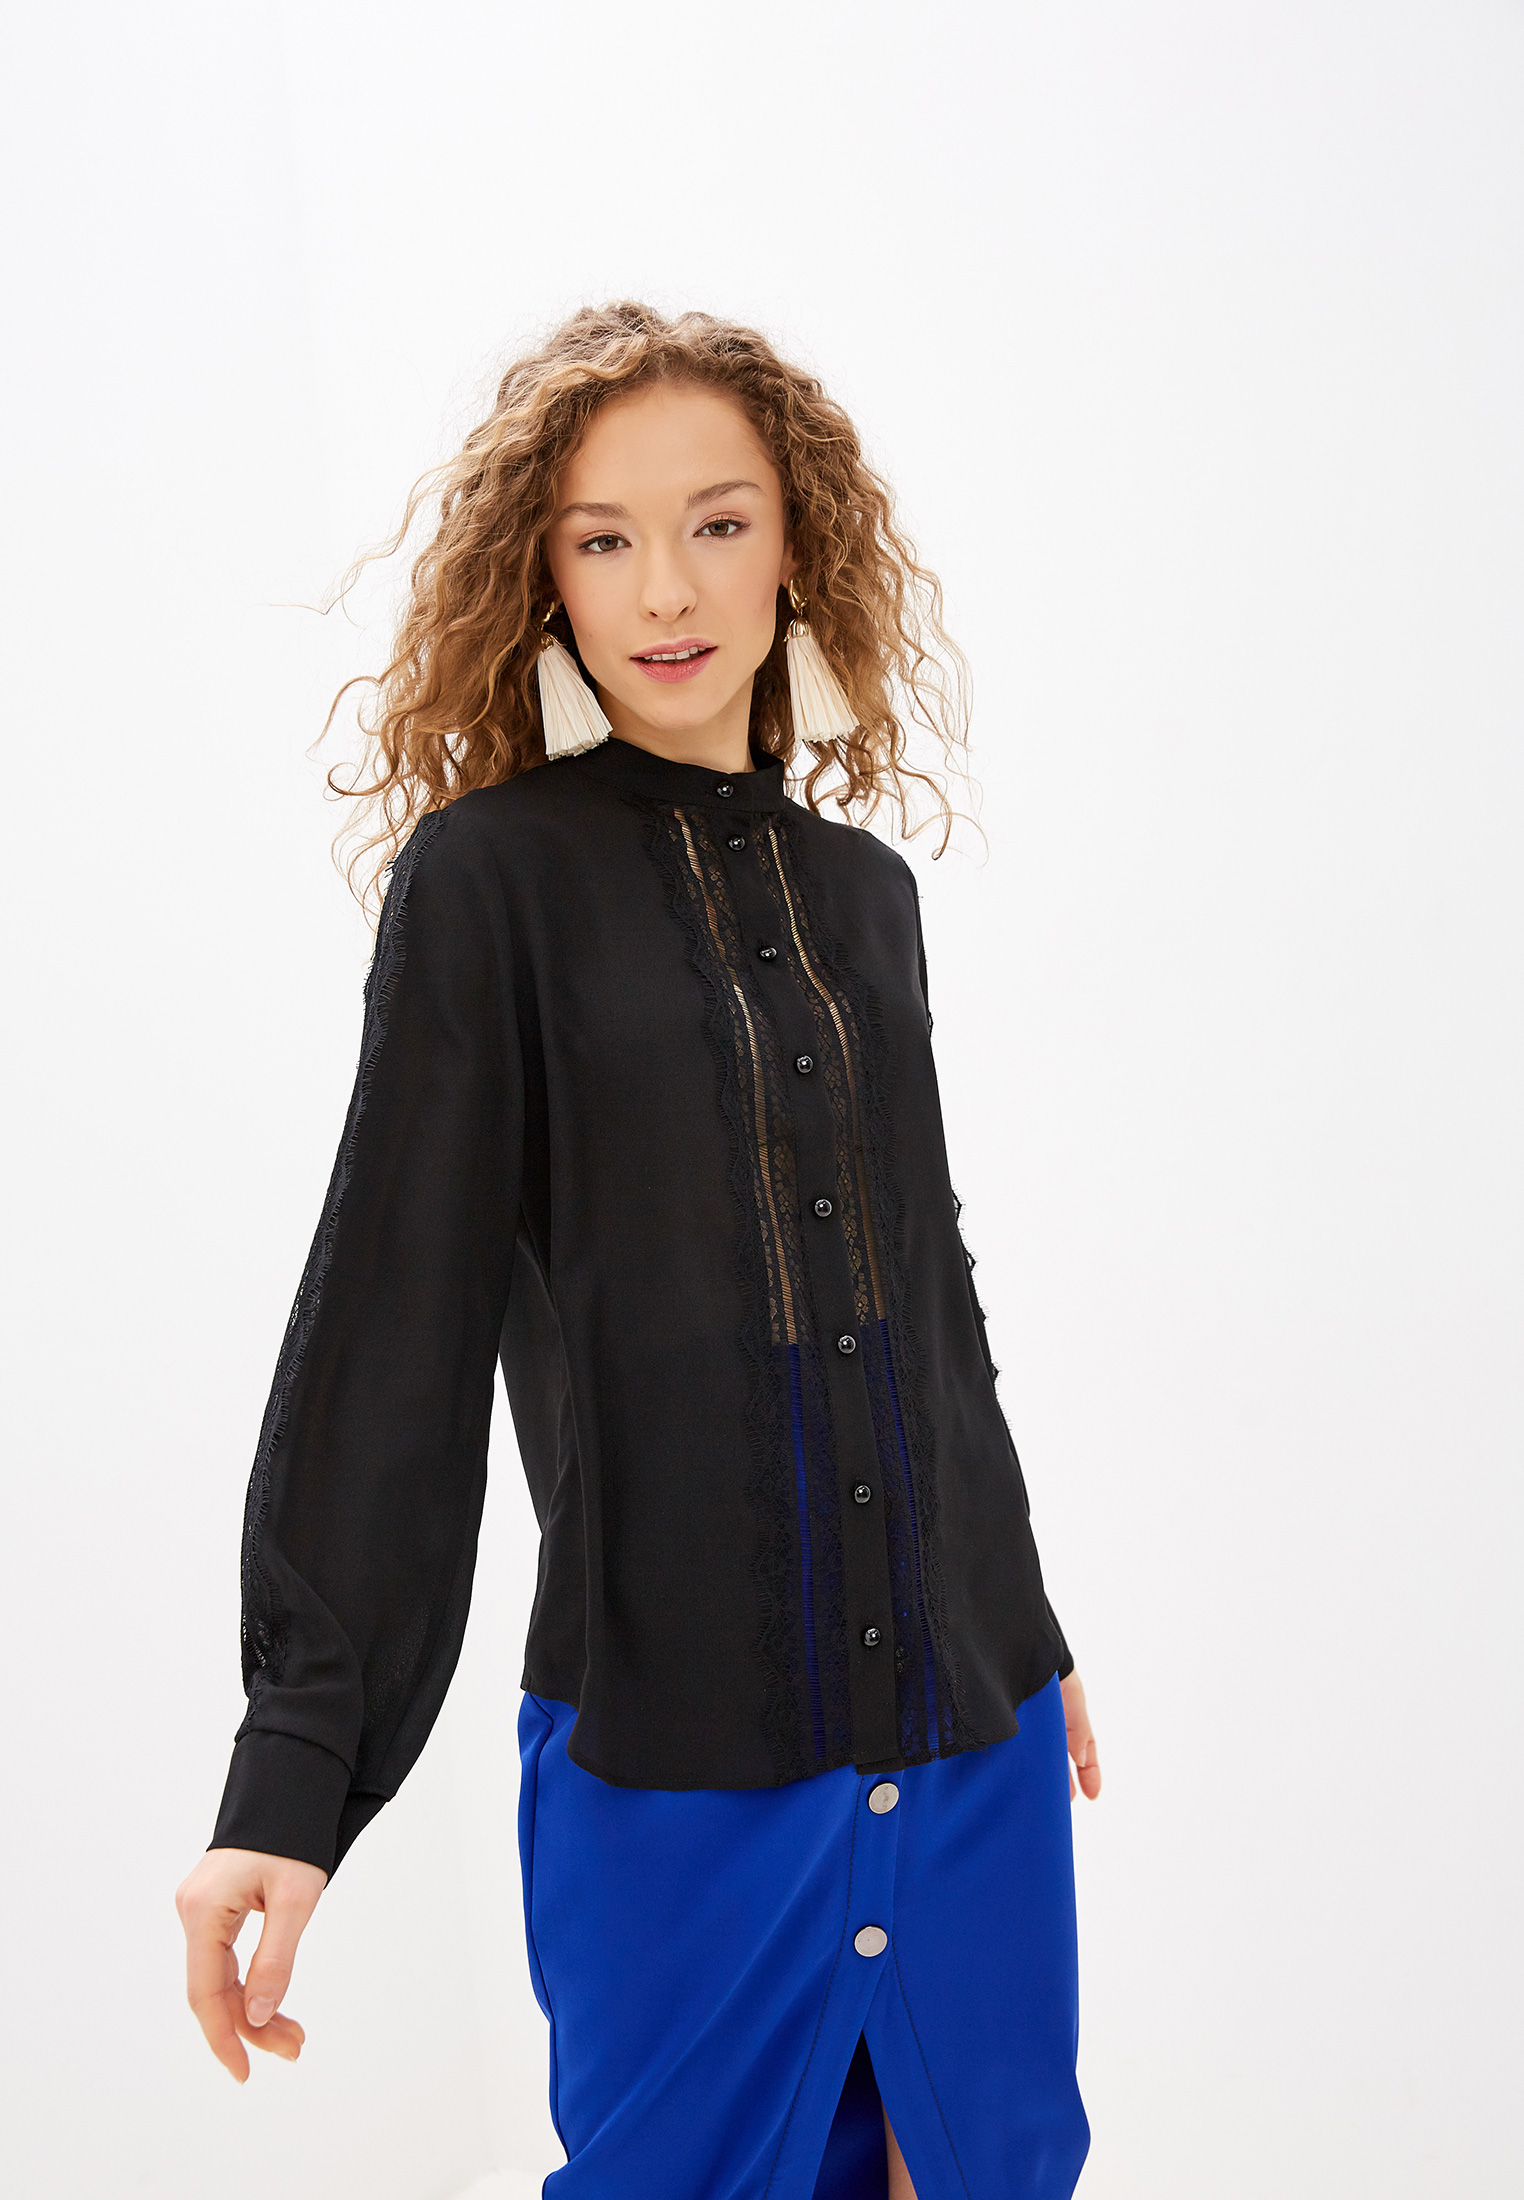 Блуза Lezzarine купить за 5 120 ₽ в интернет-магазине Lamoda.ru